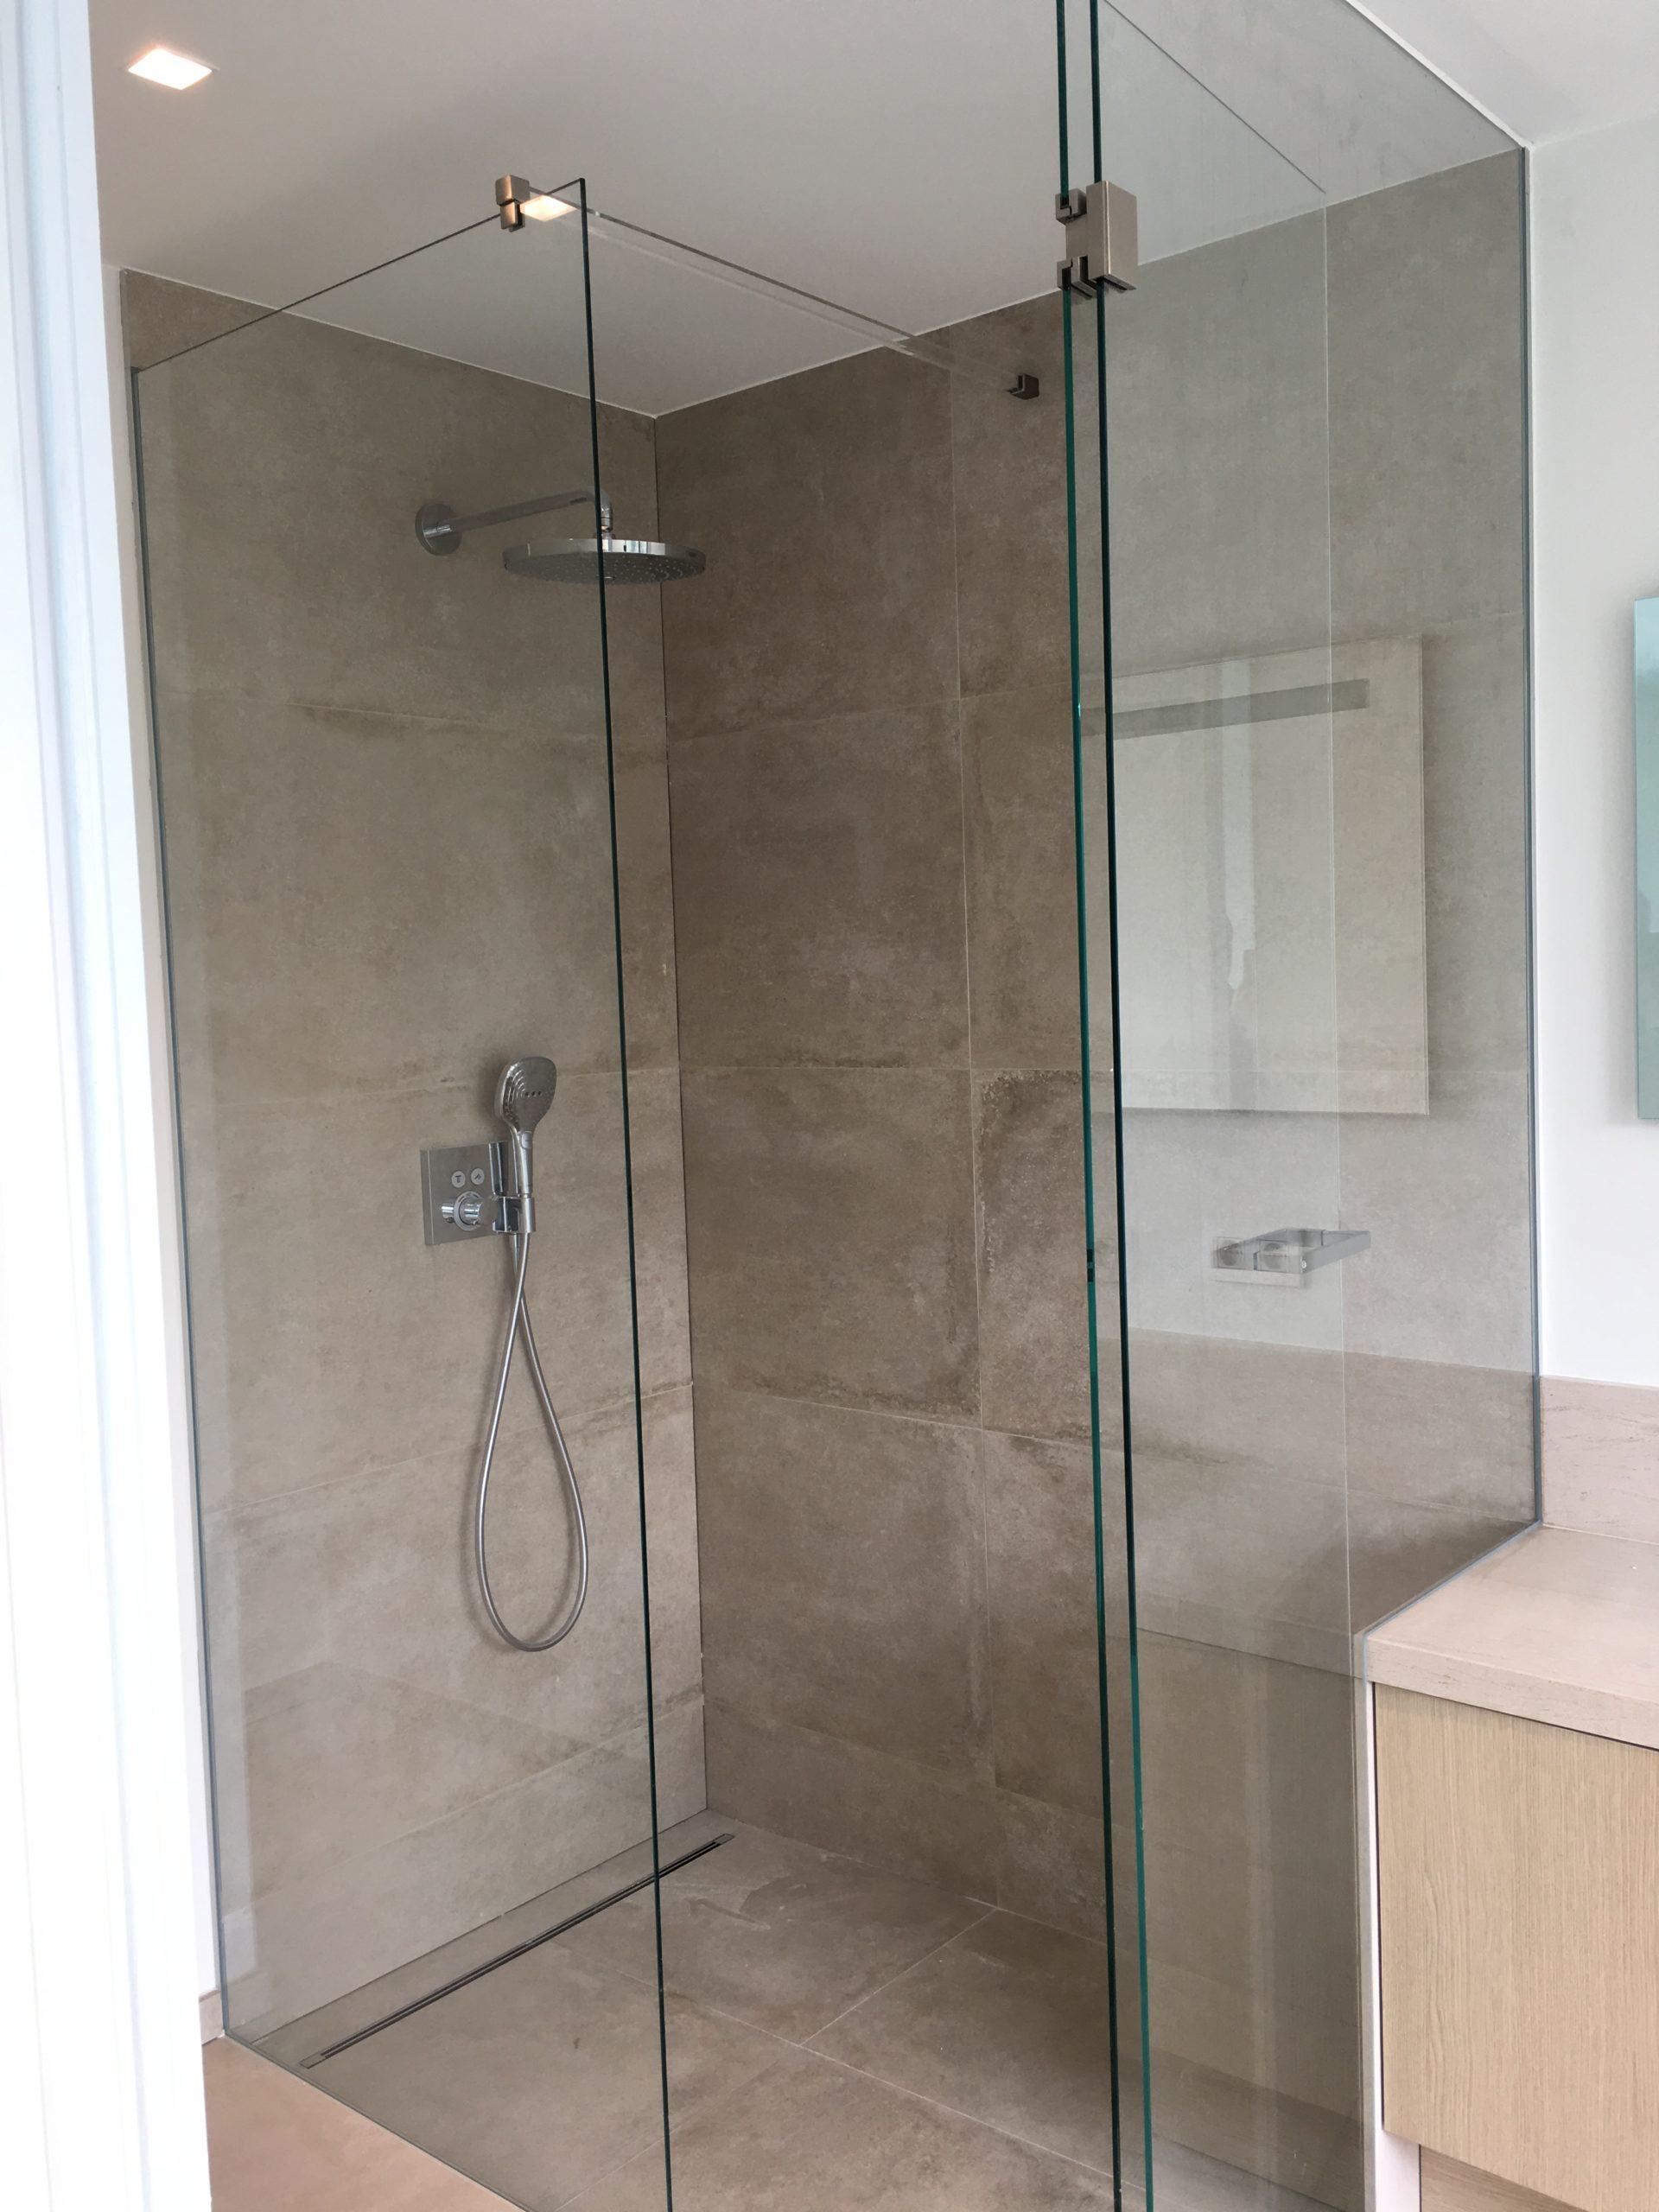 Miroiterie Leys and Fils - Installation ensemble de douche